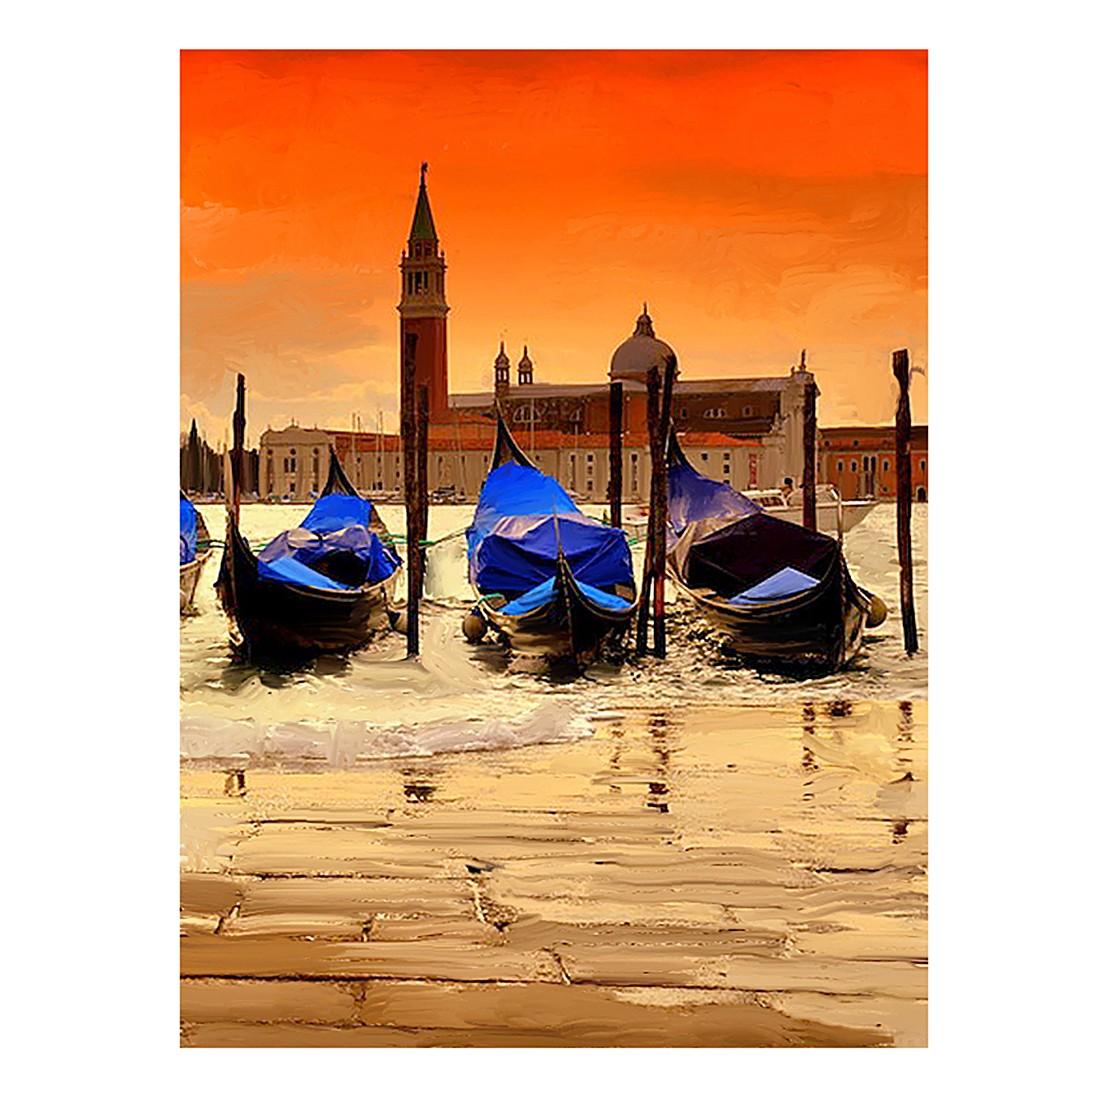 Ölgemälde Gondolas awaiting – Größe 100 x 70 cm, yourPainting online kaufen